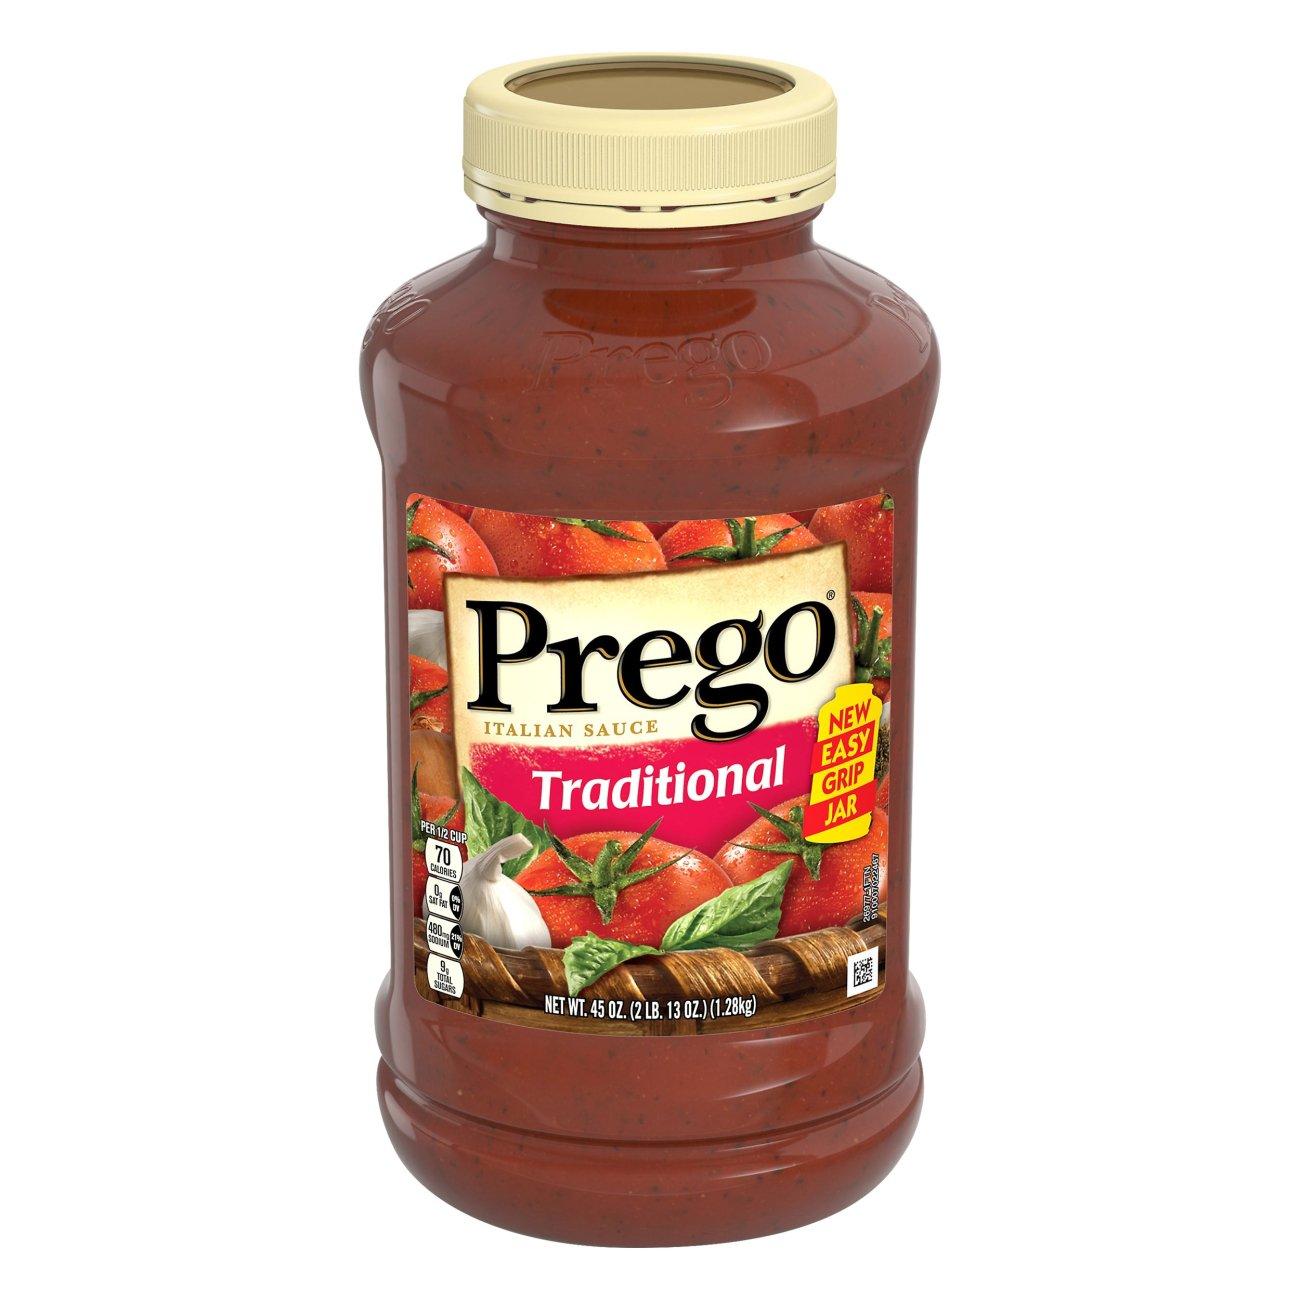 Prego Traditional Pasta Sauce ‑ Shop